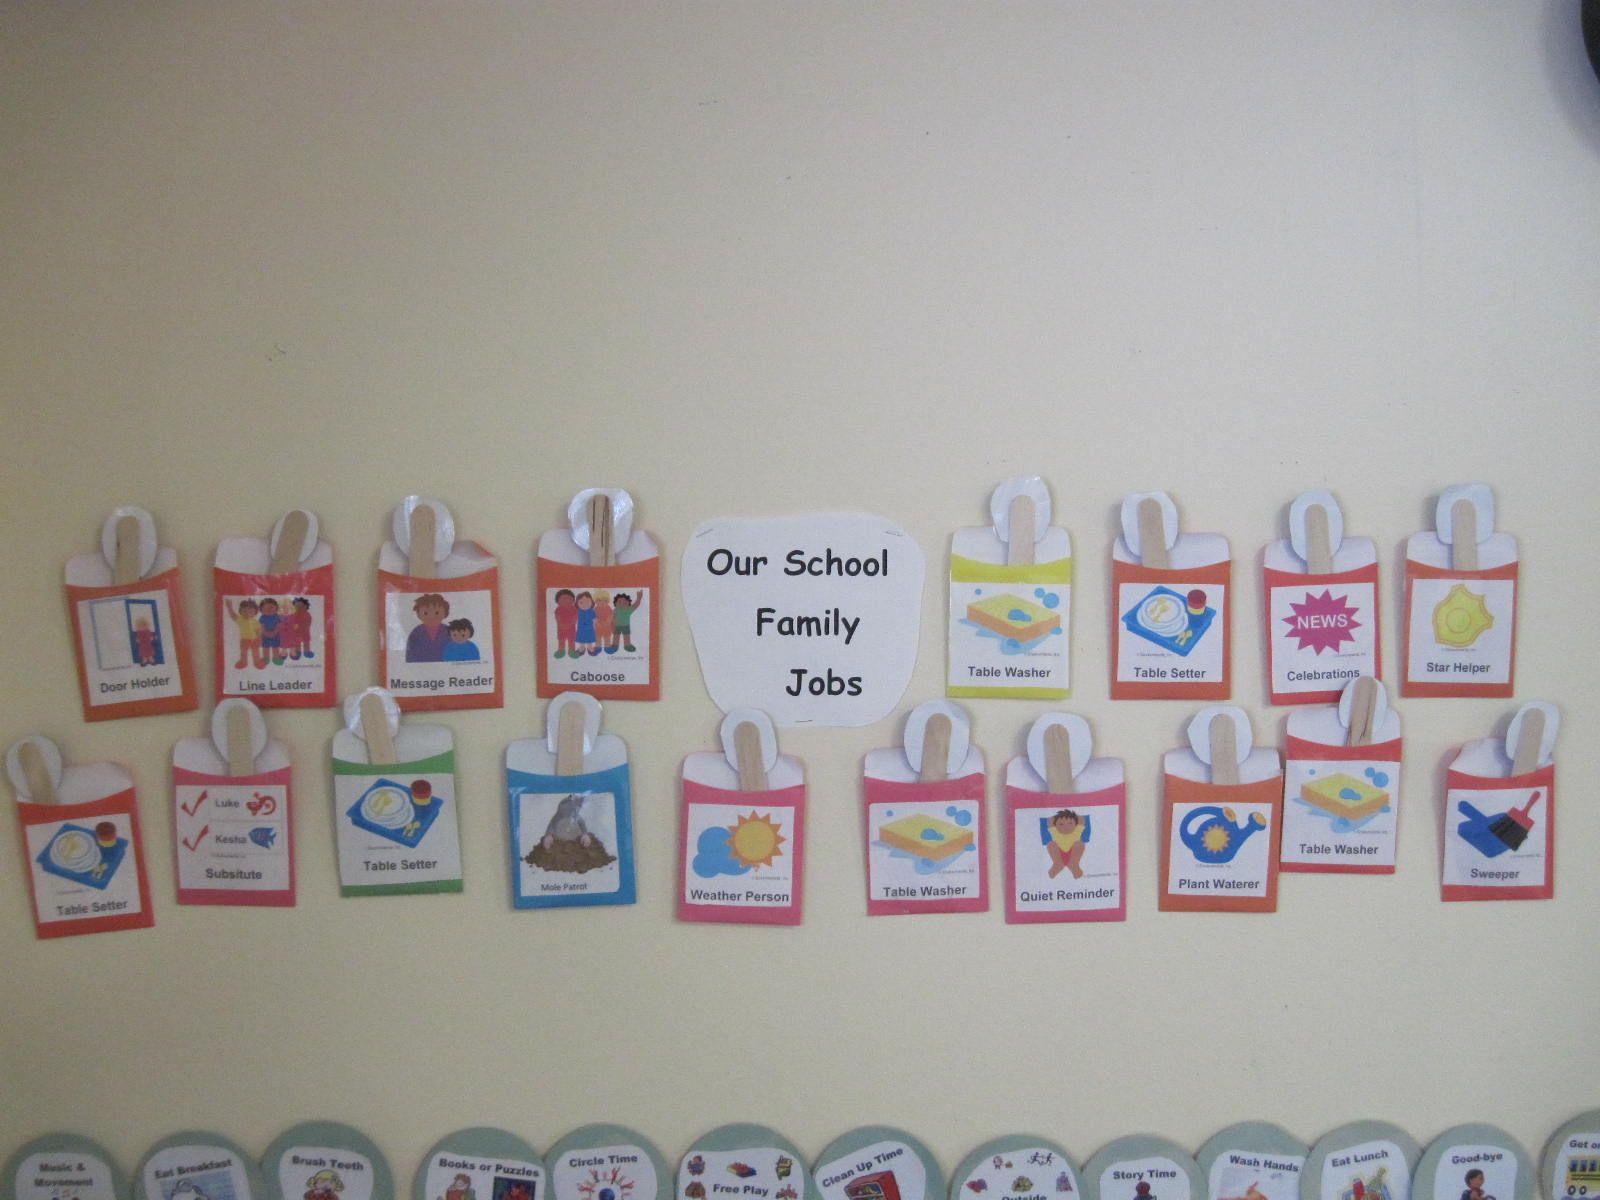 Mrs. Darcey's School Family Jobs jobs provide